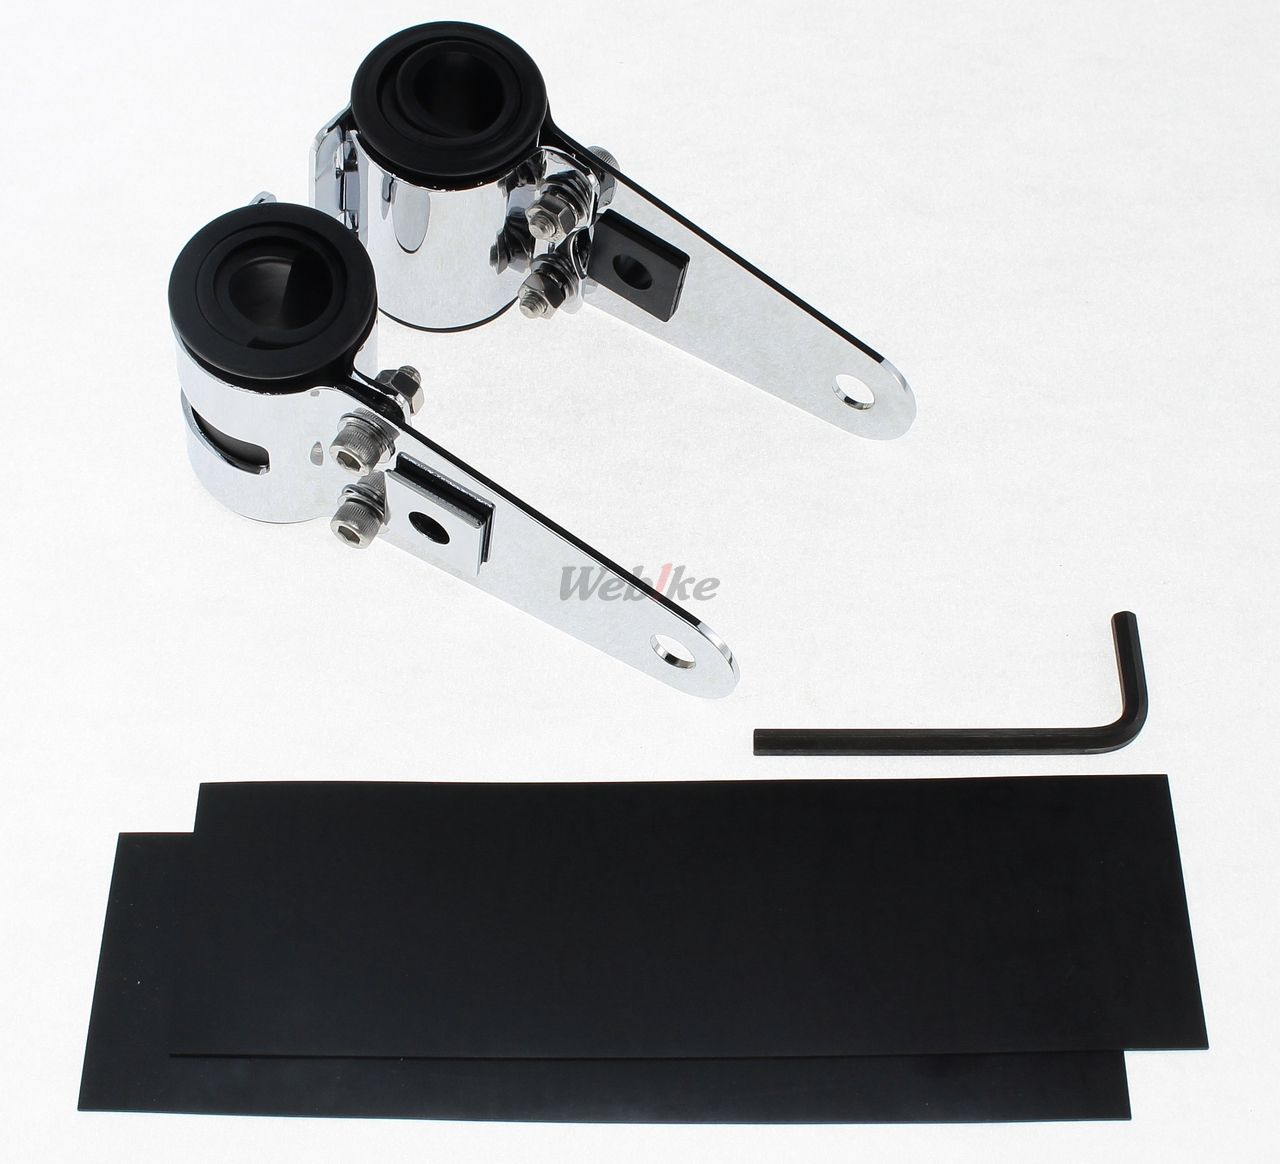 【KIJIMA】鋼製頭燈支架 - 「Webike-摩托百貨」